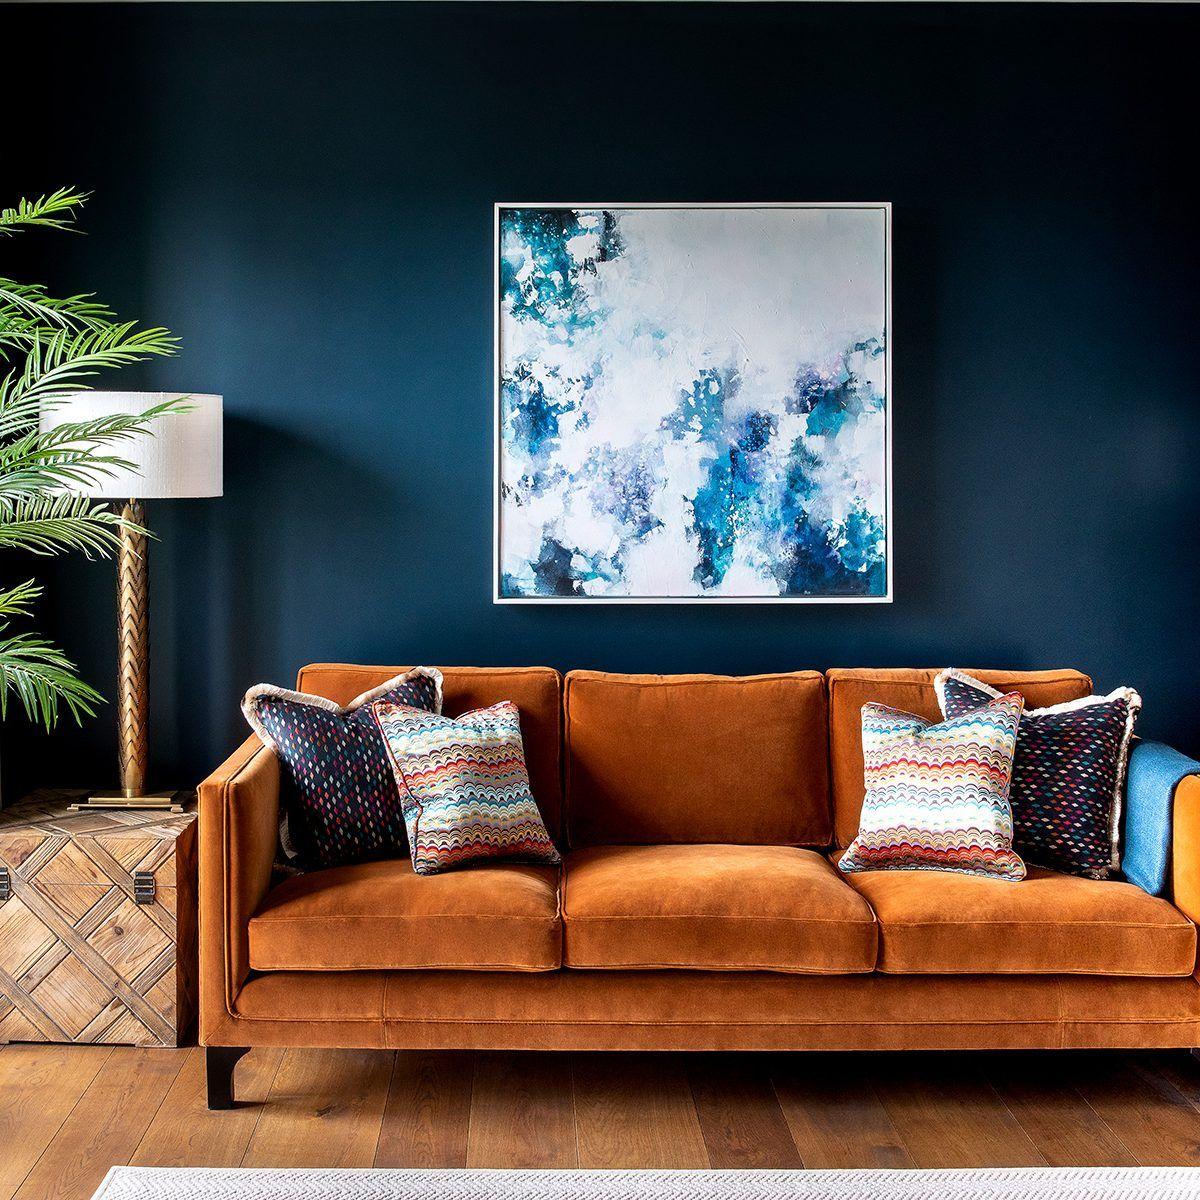 Home Design cover image